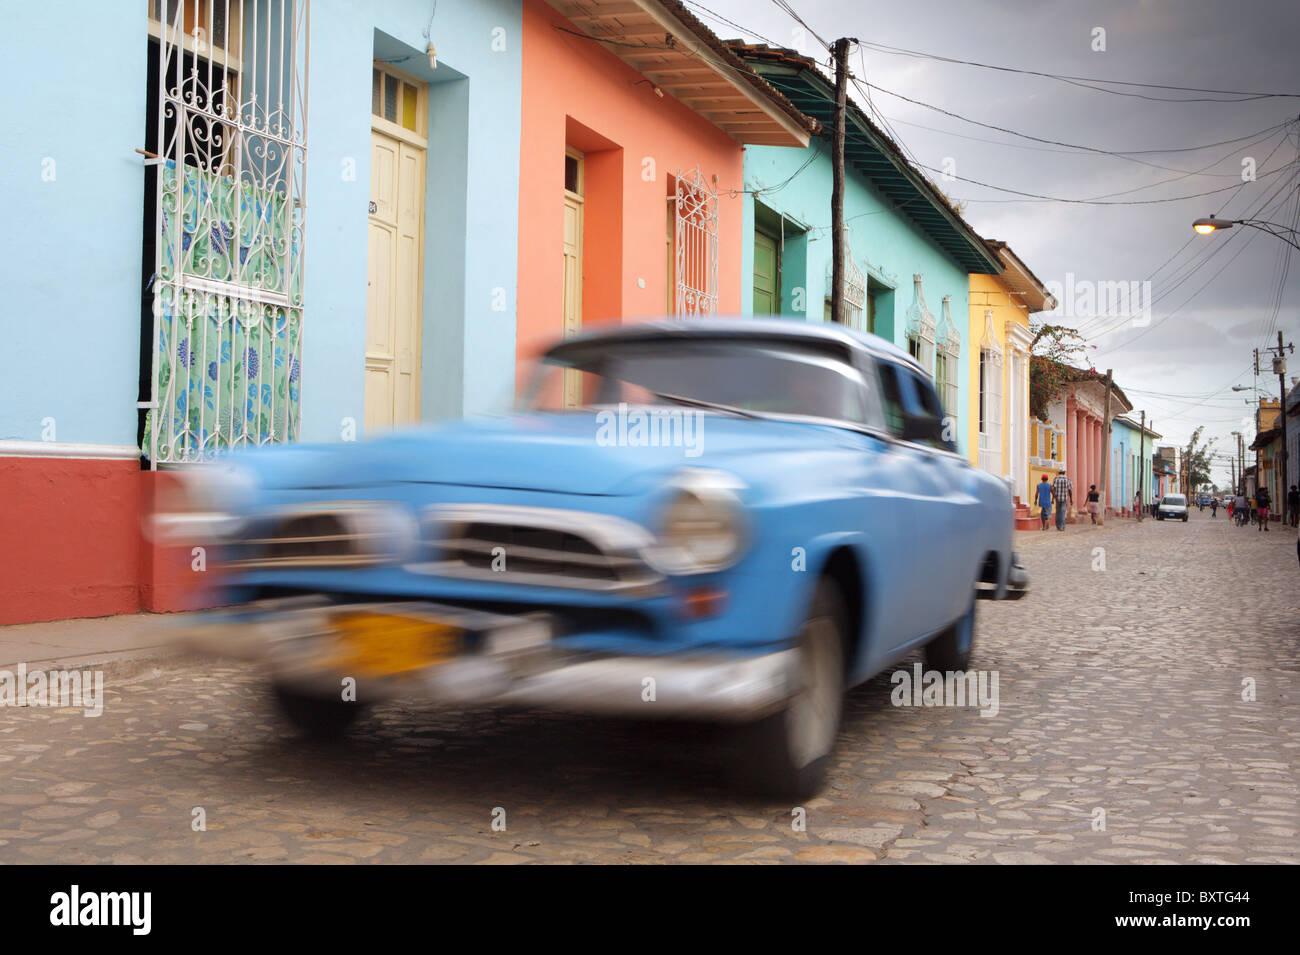 TRINIDAD: carro clássico no meio de coloridos rua colonial Imagens de Stock